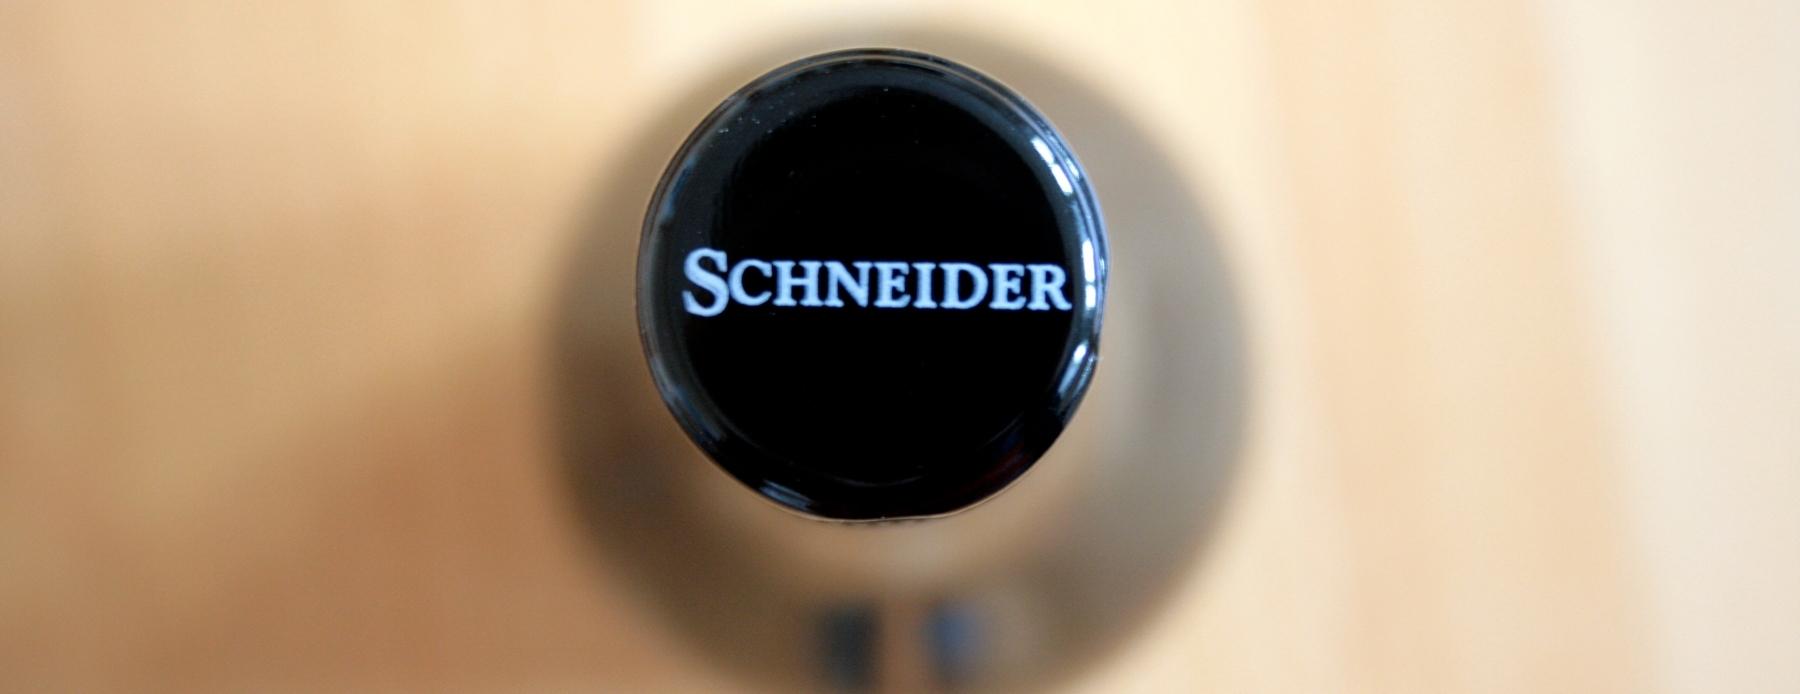 MSchneider_BG